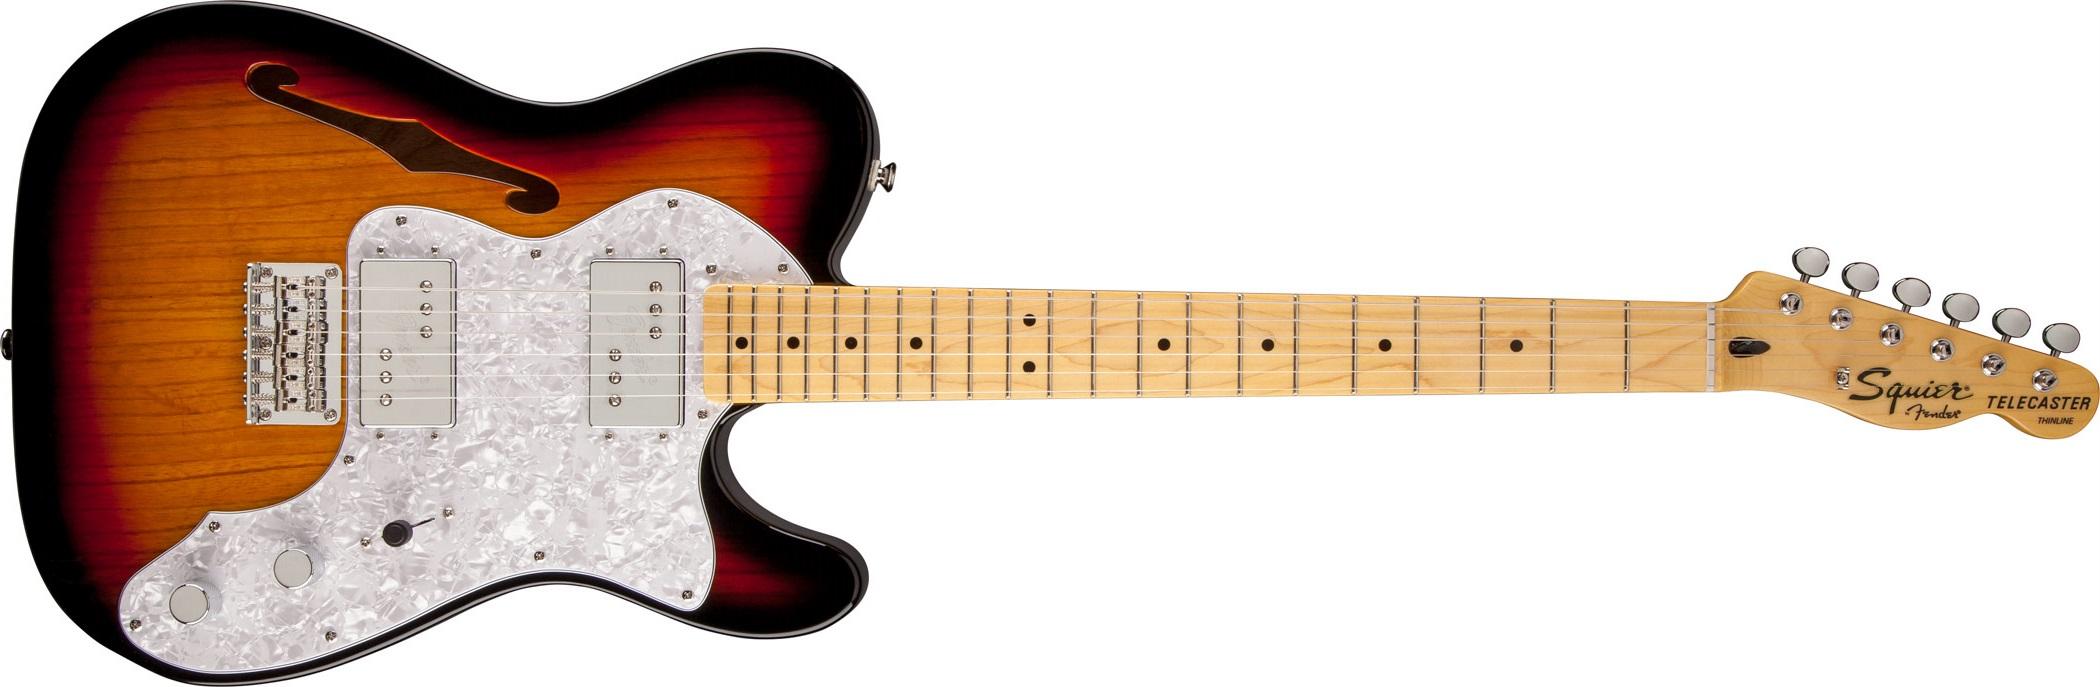 Fender Squier Vintage Modified 72 Tele Thinline MN 3TS